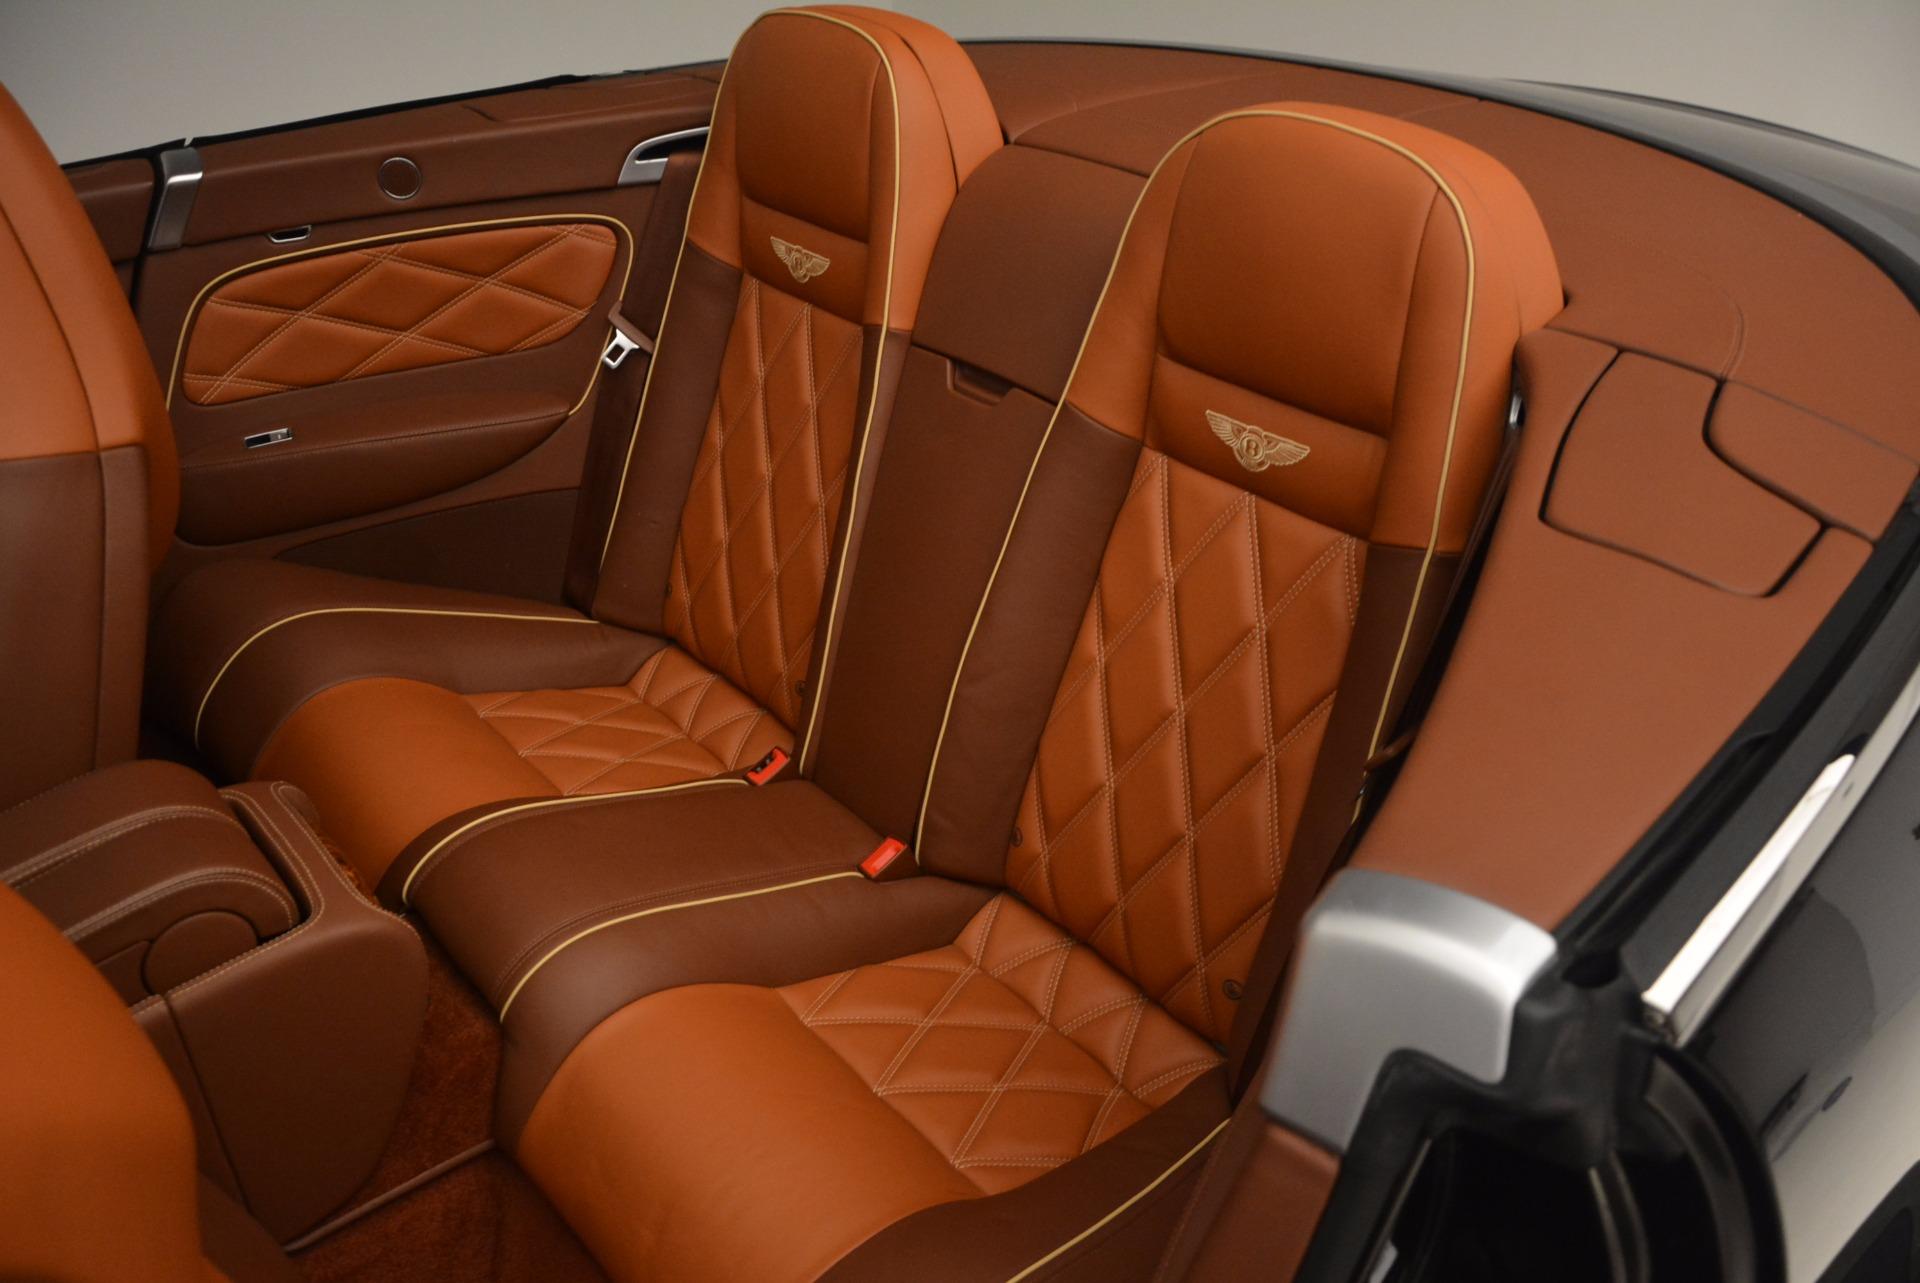 Used 2010 Bentley Continental GT Series 51 For Sale In Westport, CT 1222_p37